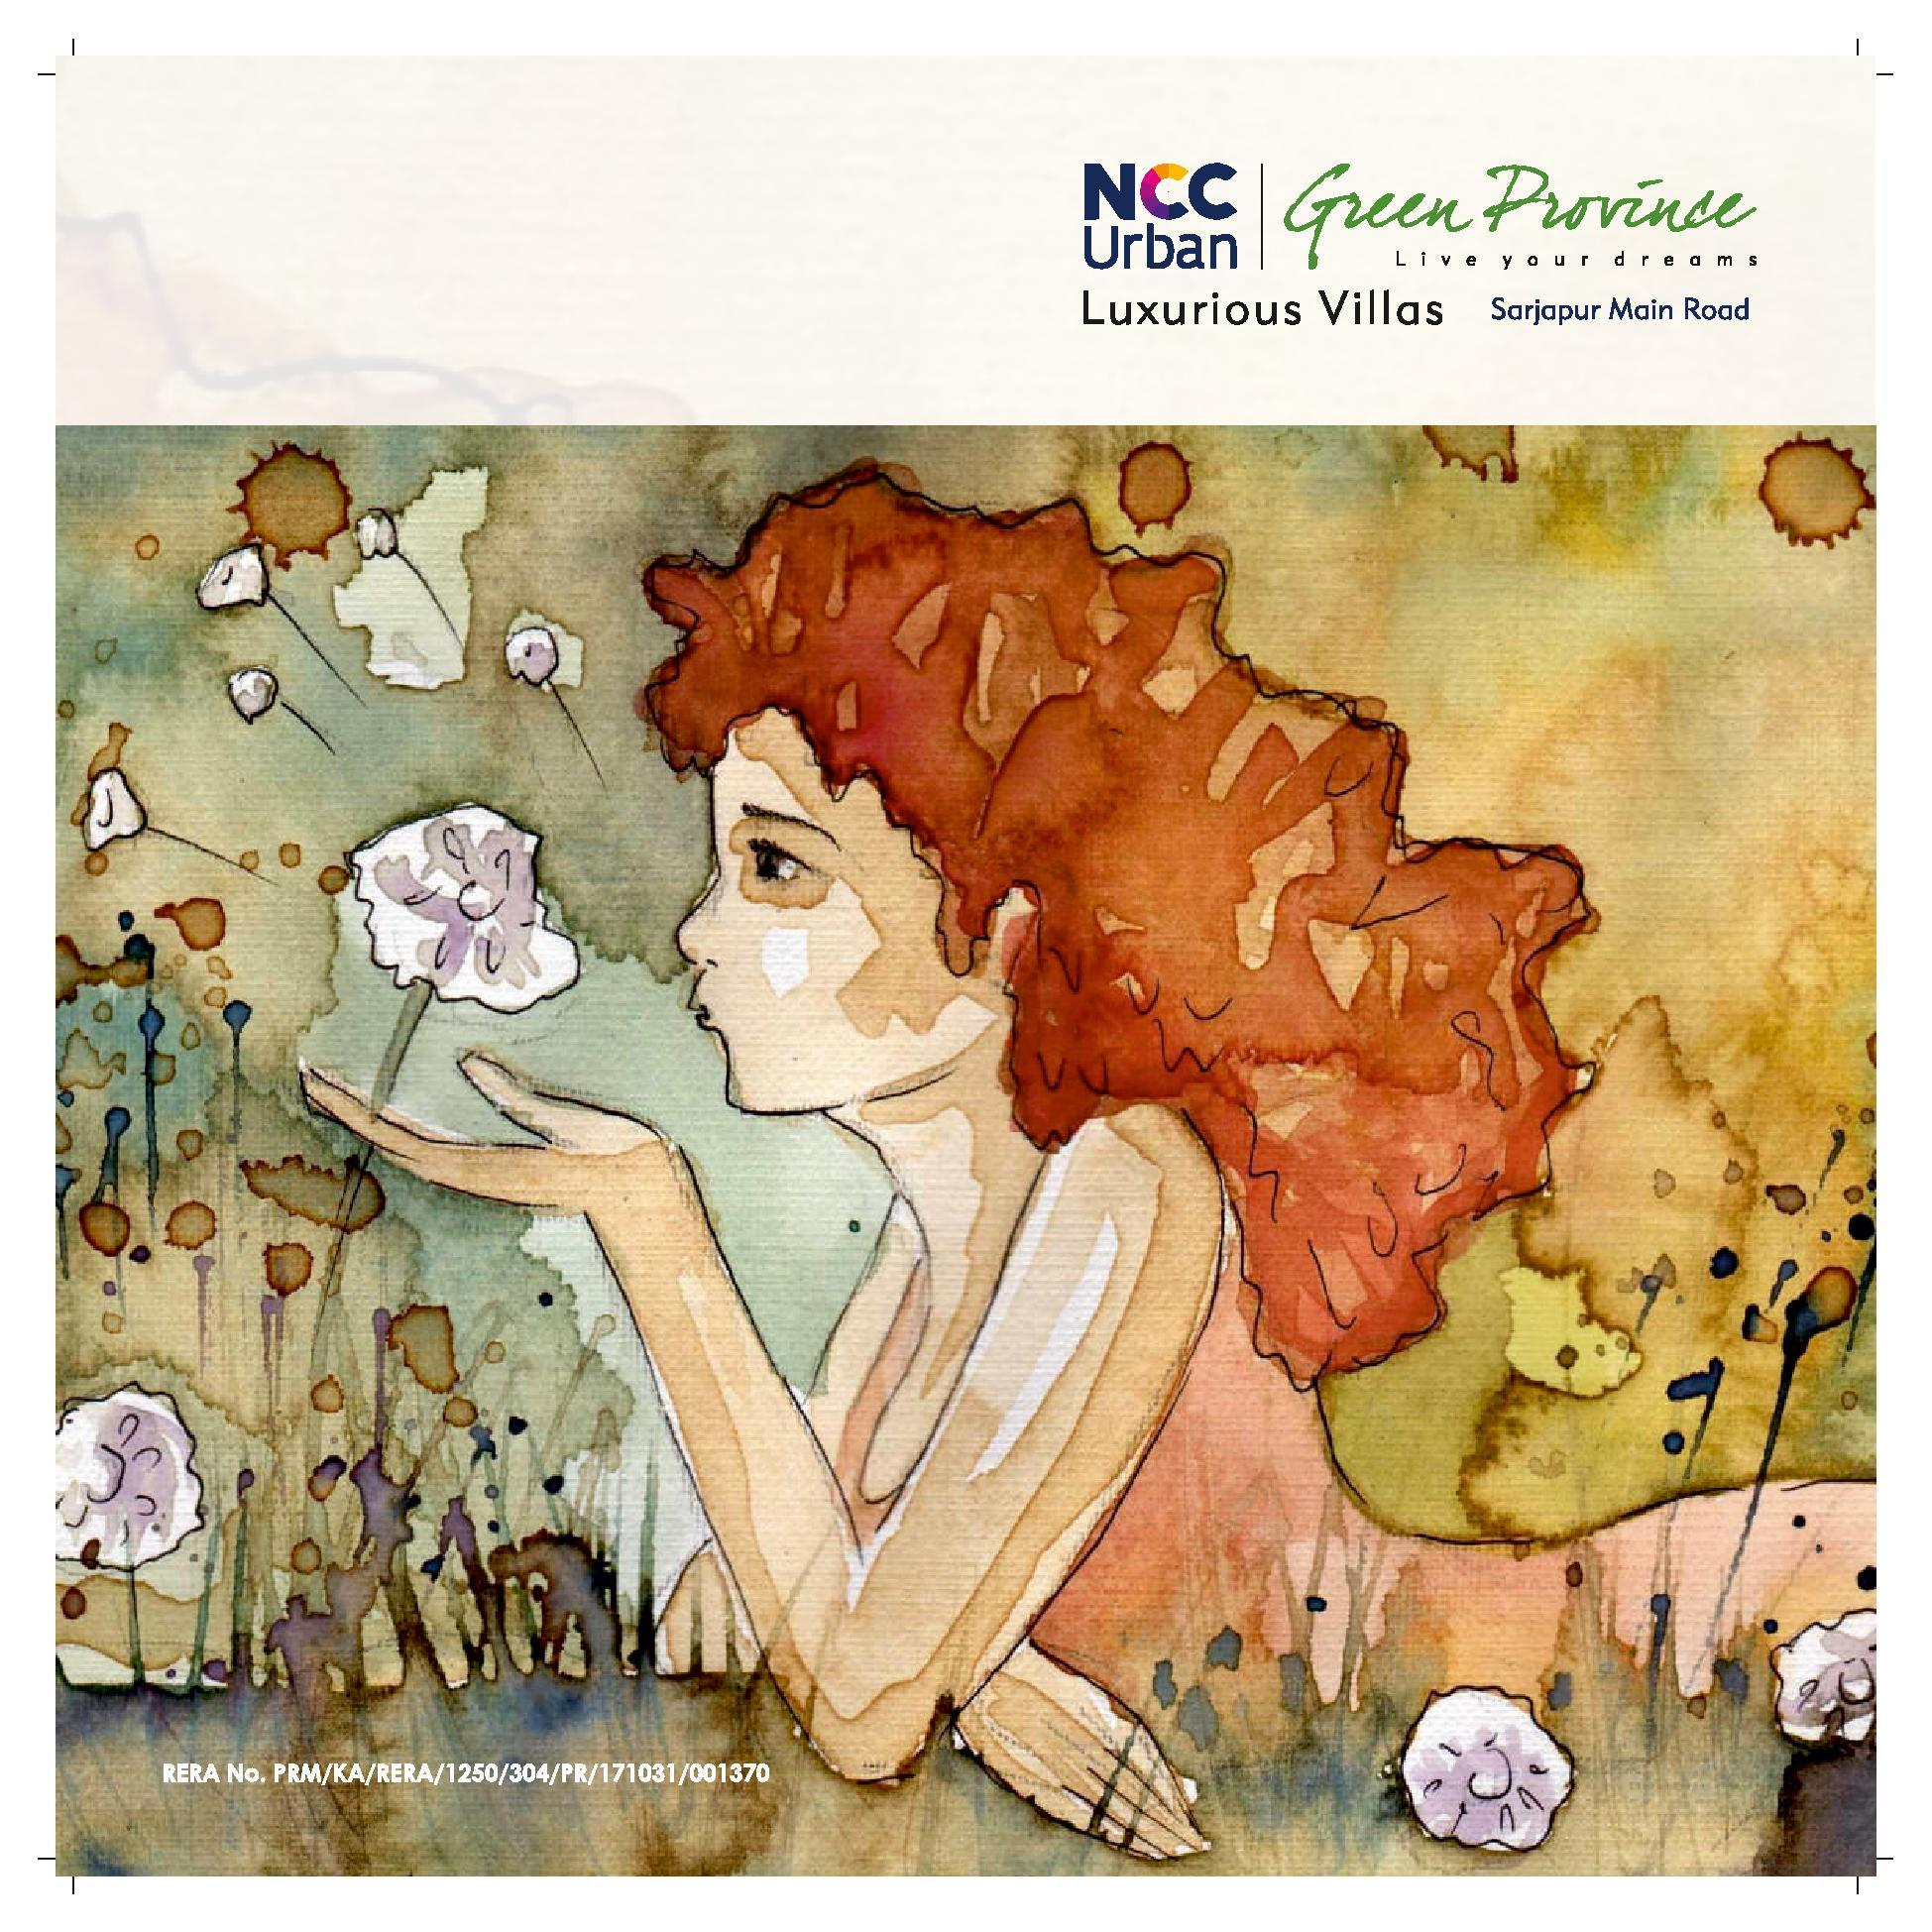 Ncc-Urban-Greens-Province-Gallery (2)